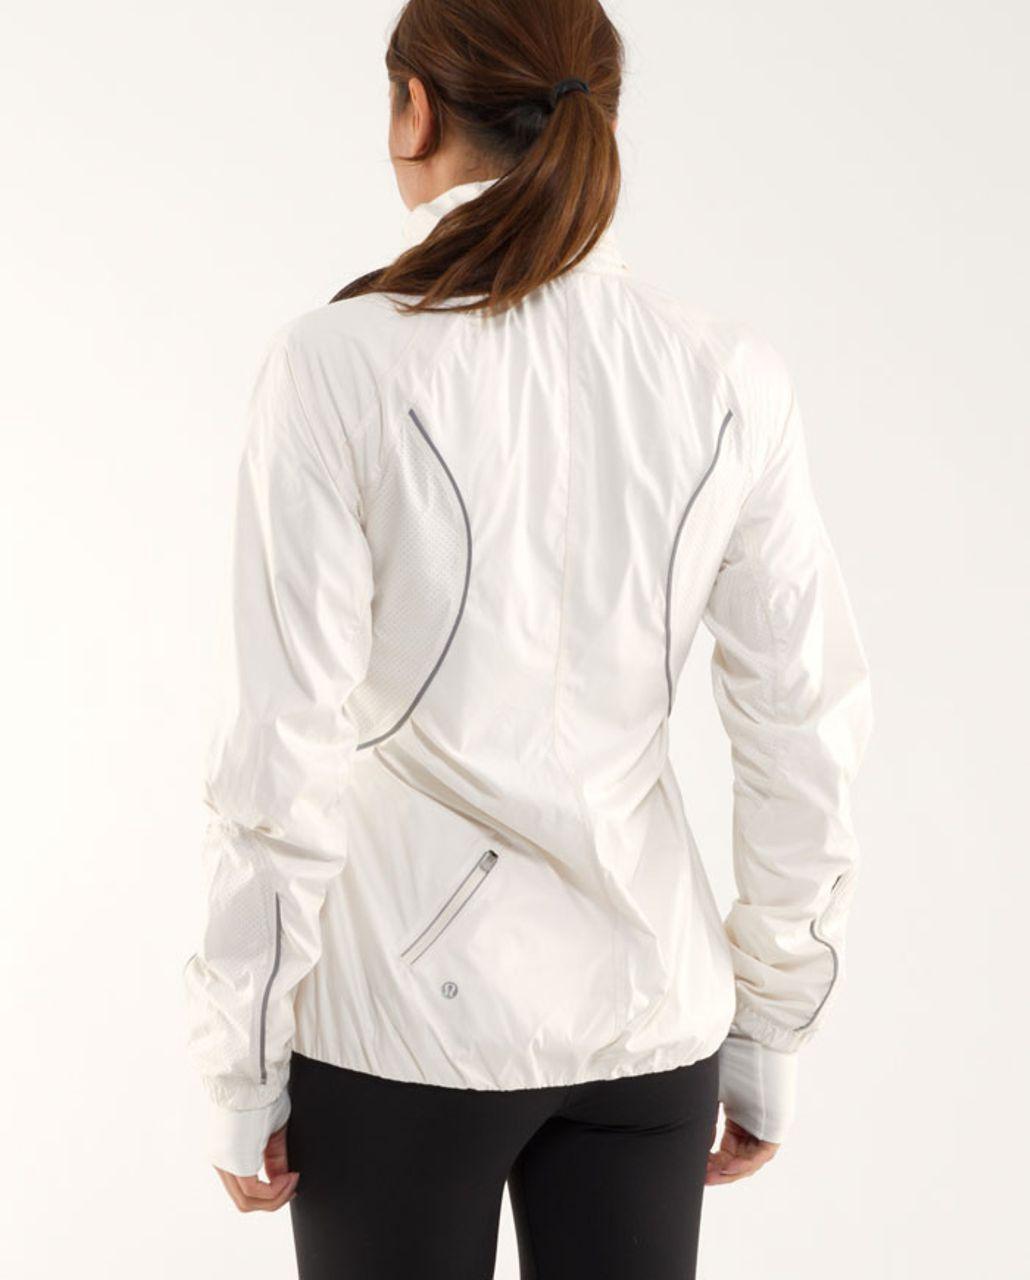 Lululemon Run:  Inspire Jacket - Ghost